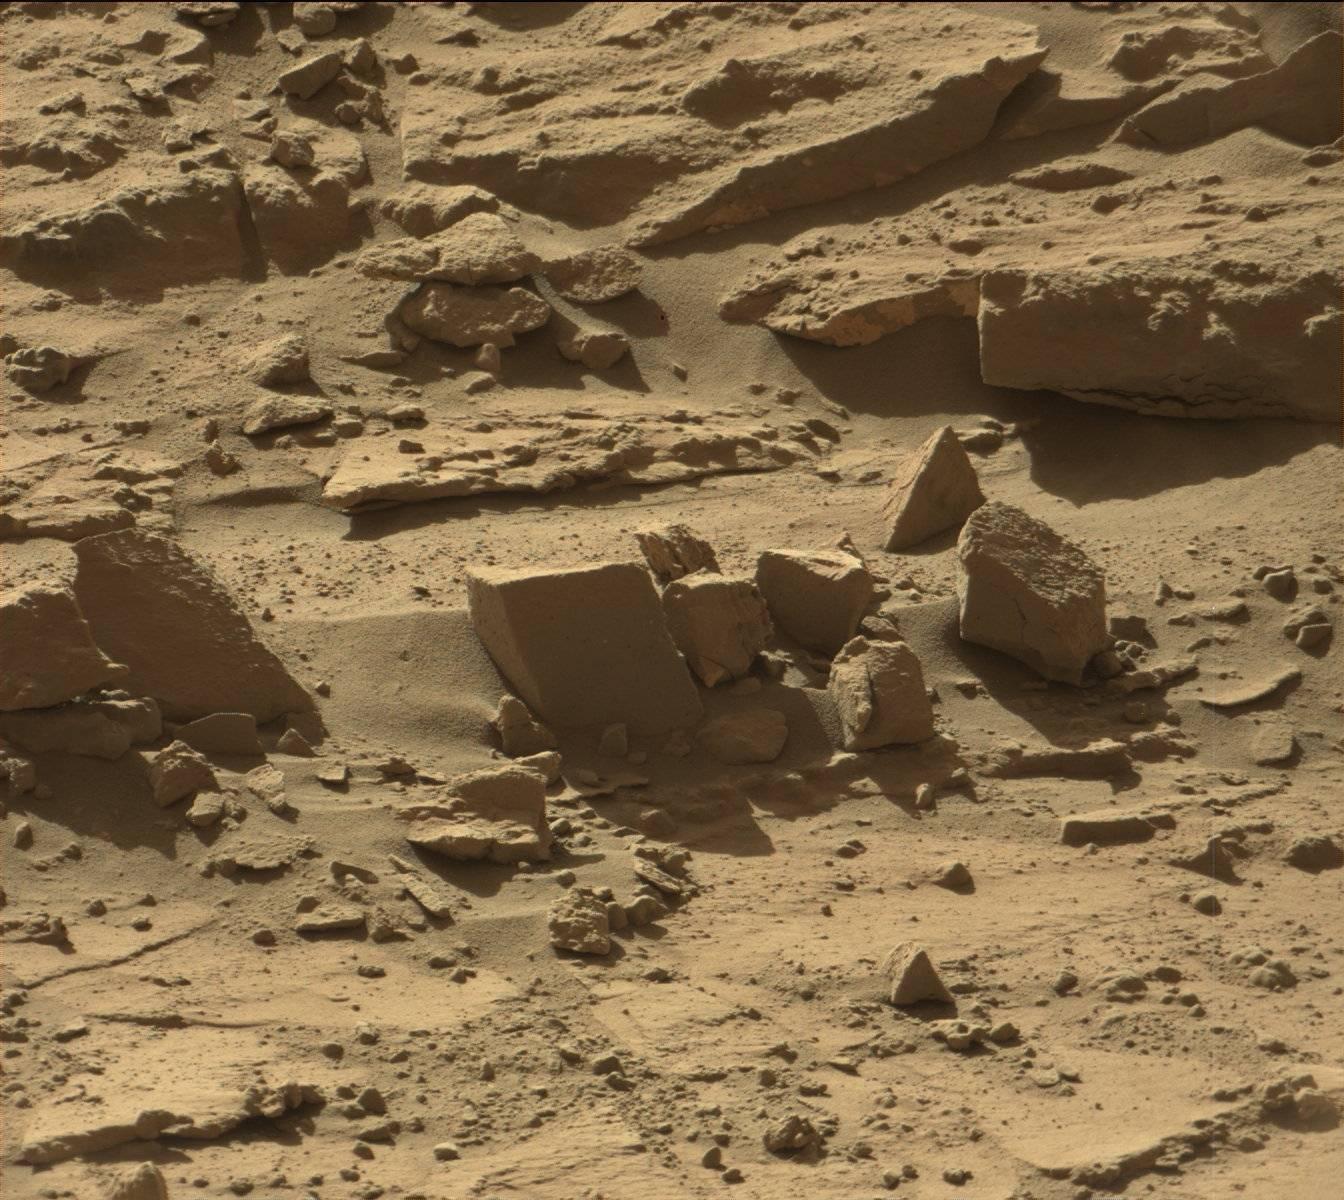 nasa life on mars rumor - photo #39